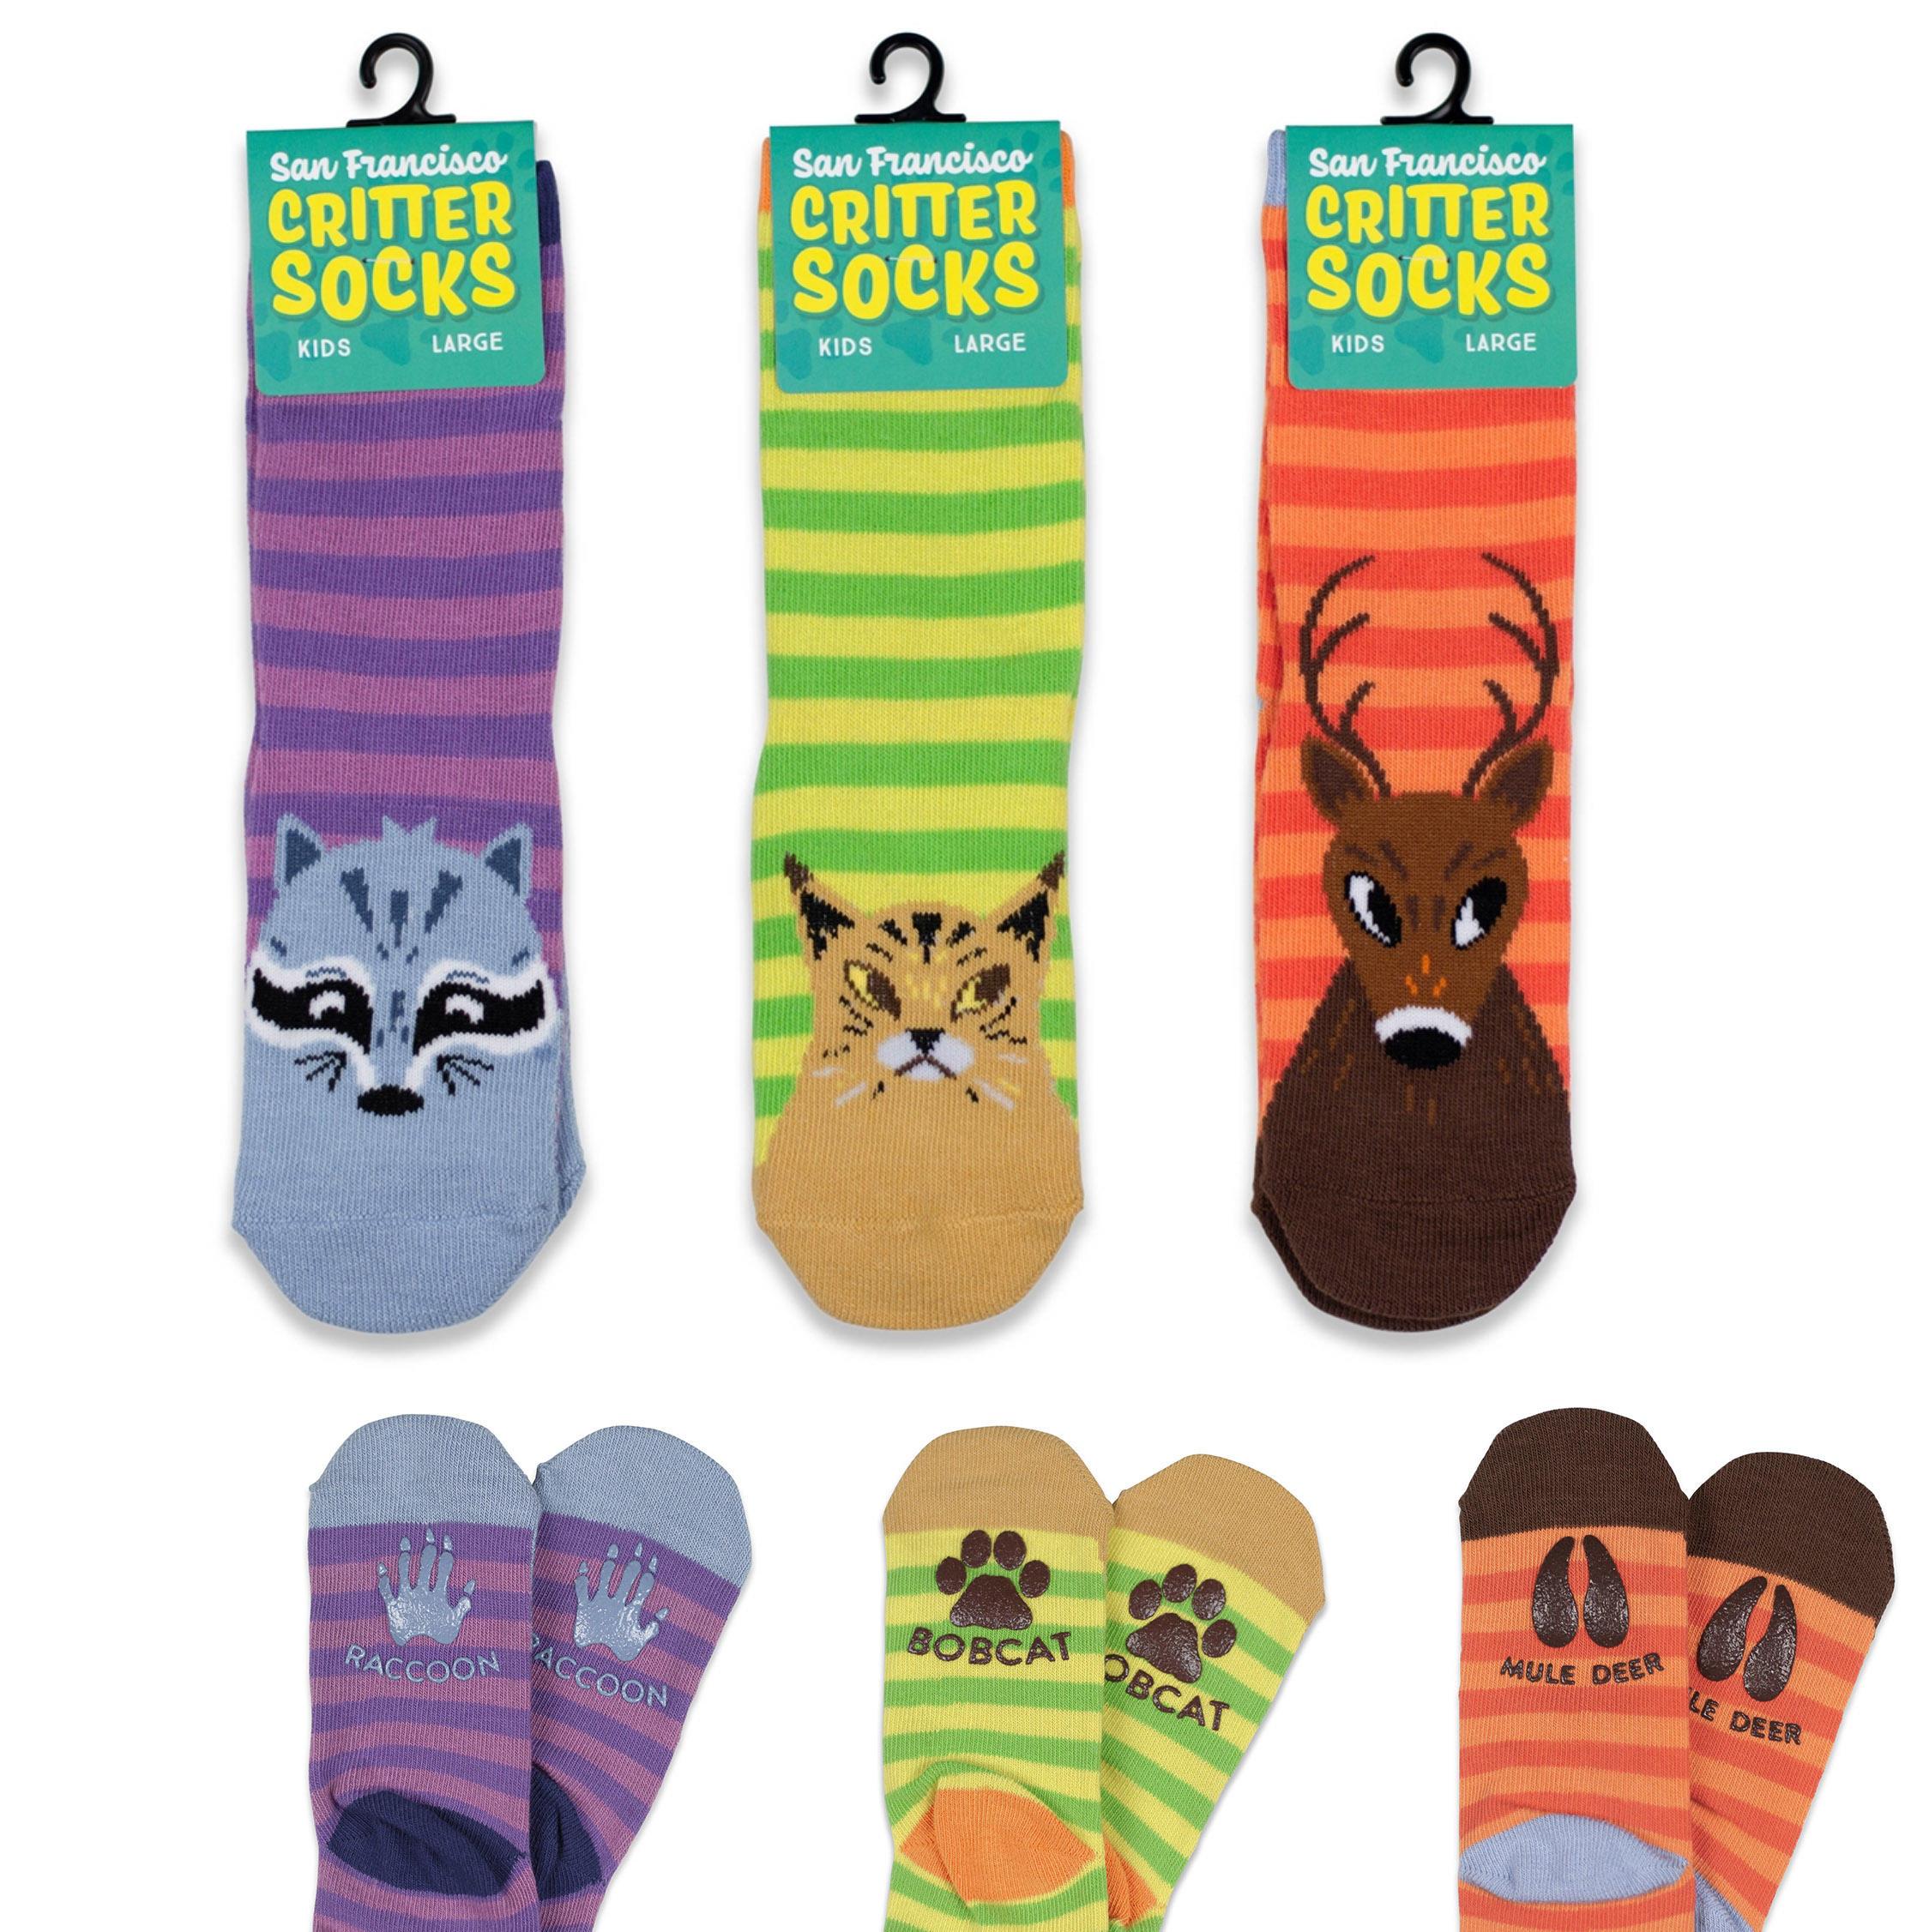 San Francisco Critter Socks, from left: raccoon, bobcat, mule deer.